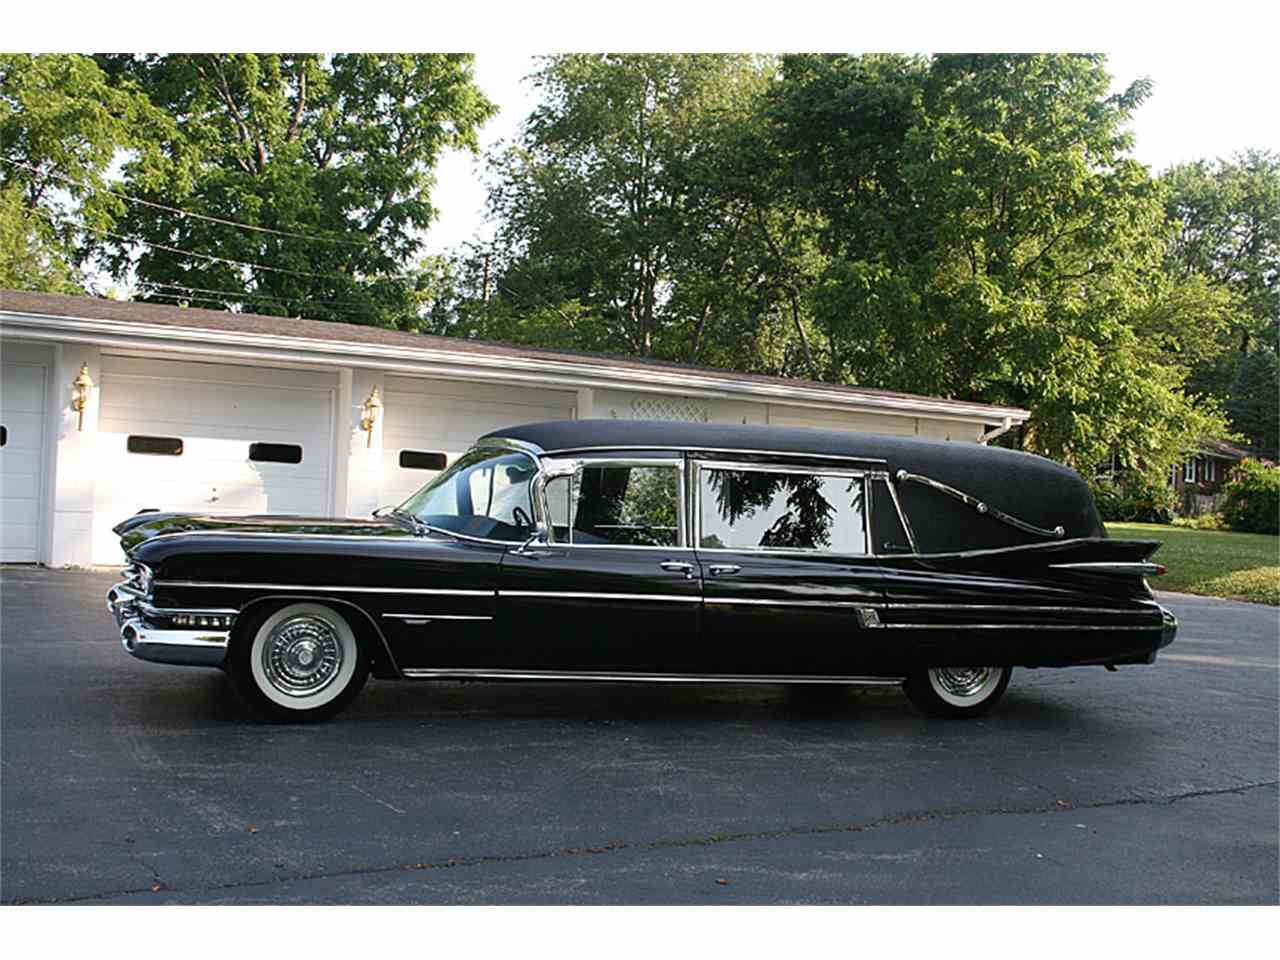 1959 Cadillac S&S Landau Victoria 3-Way He for Sale ...